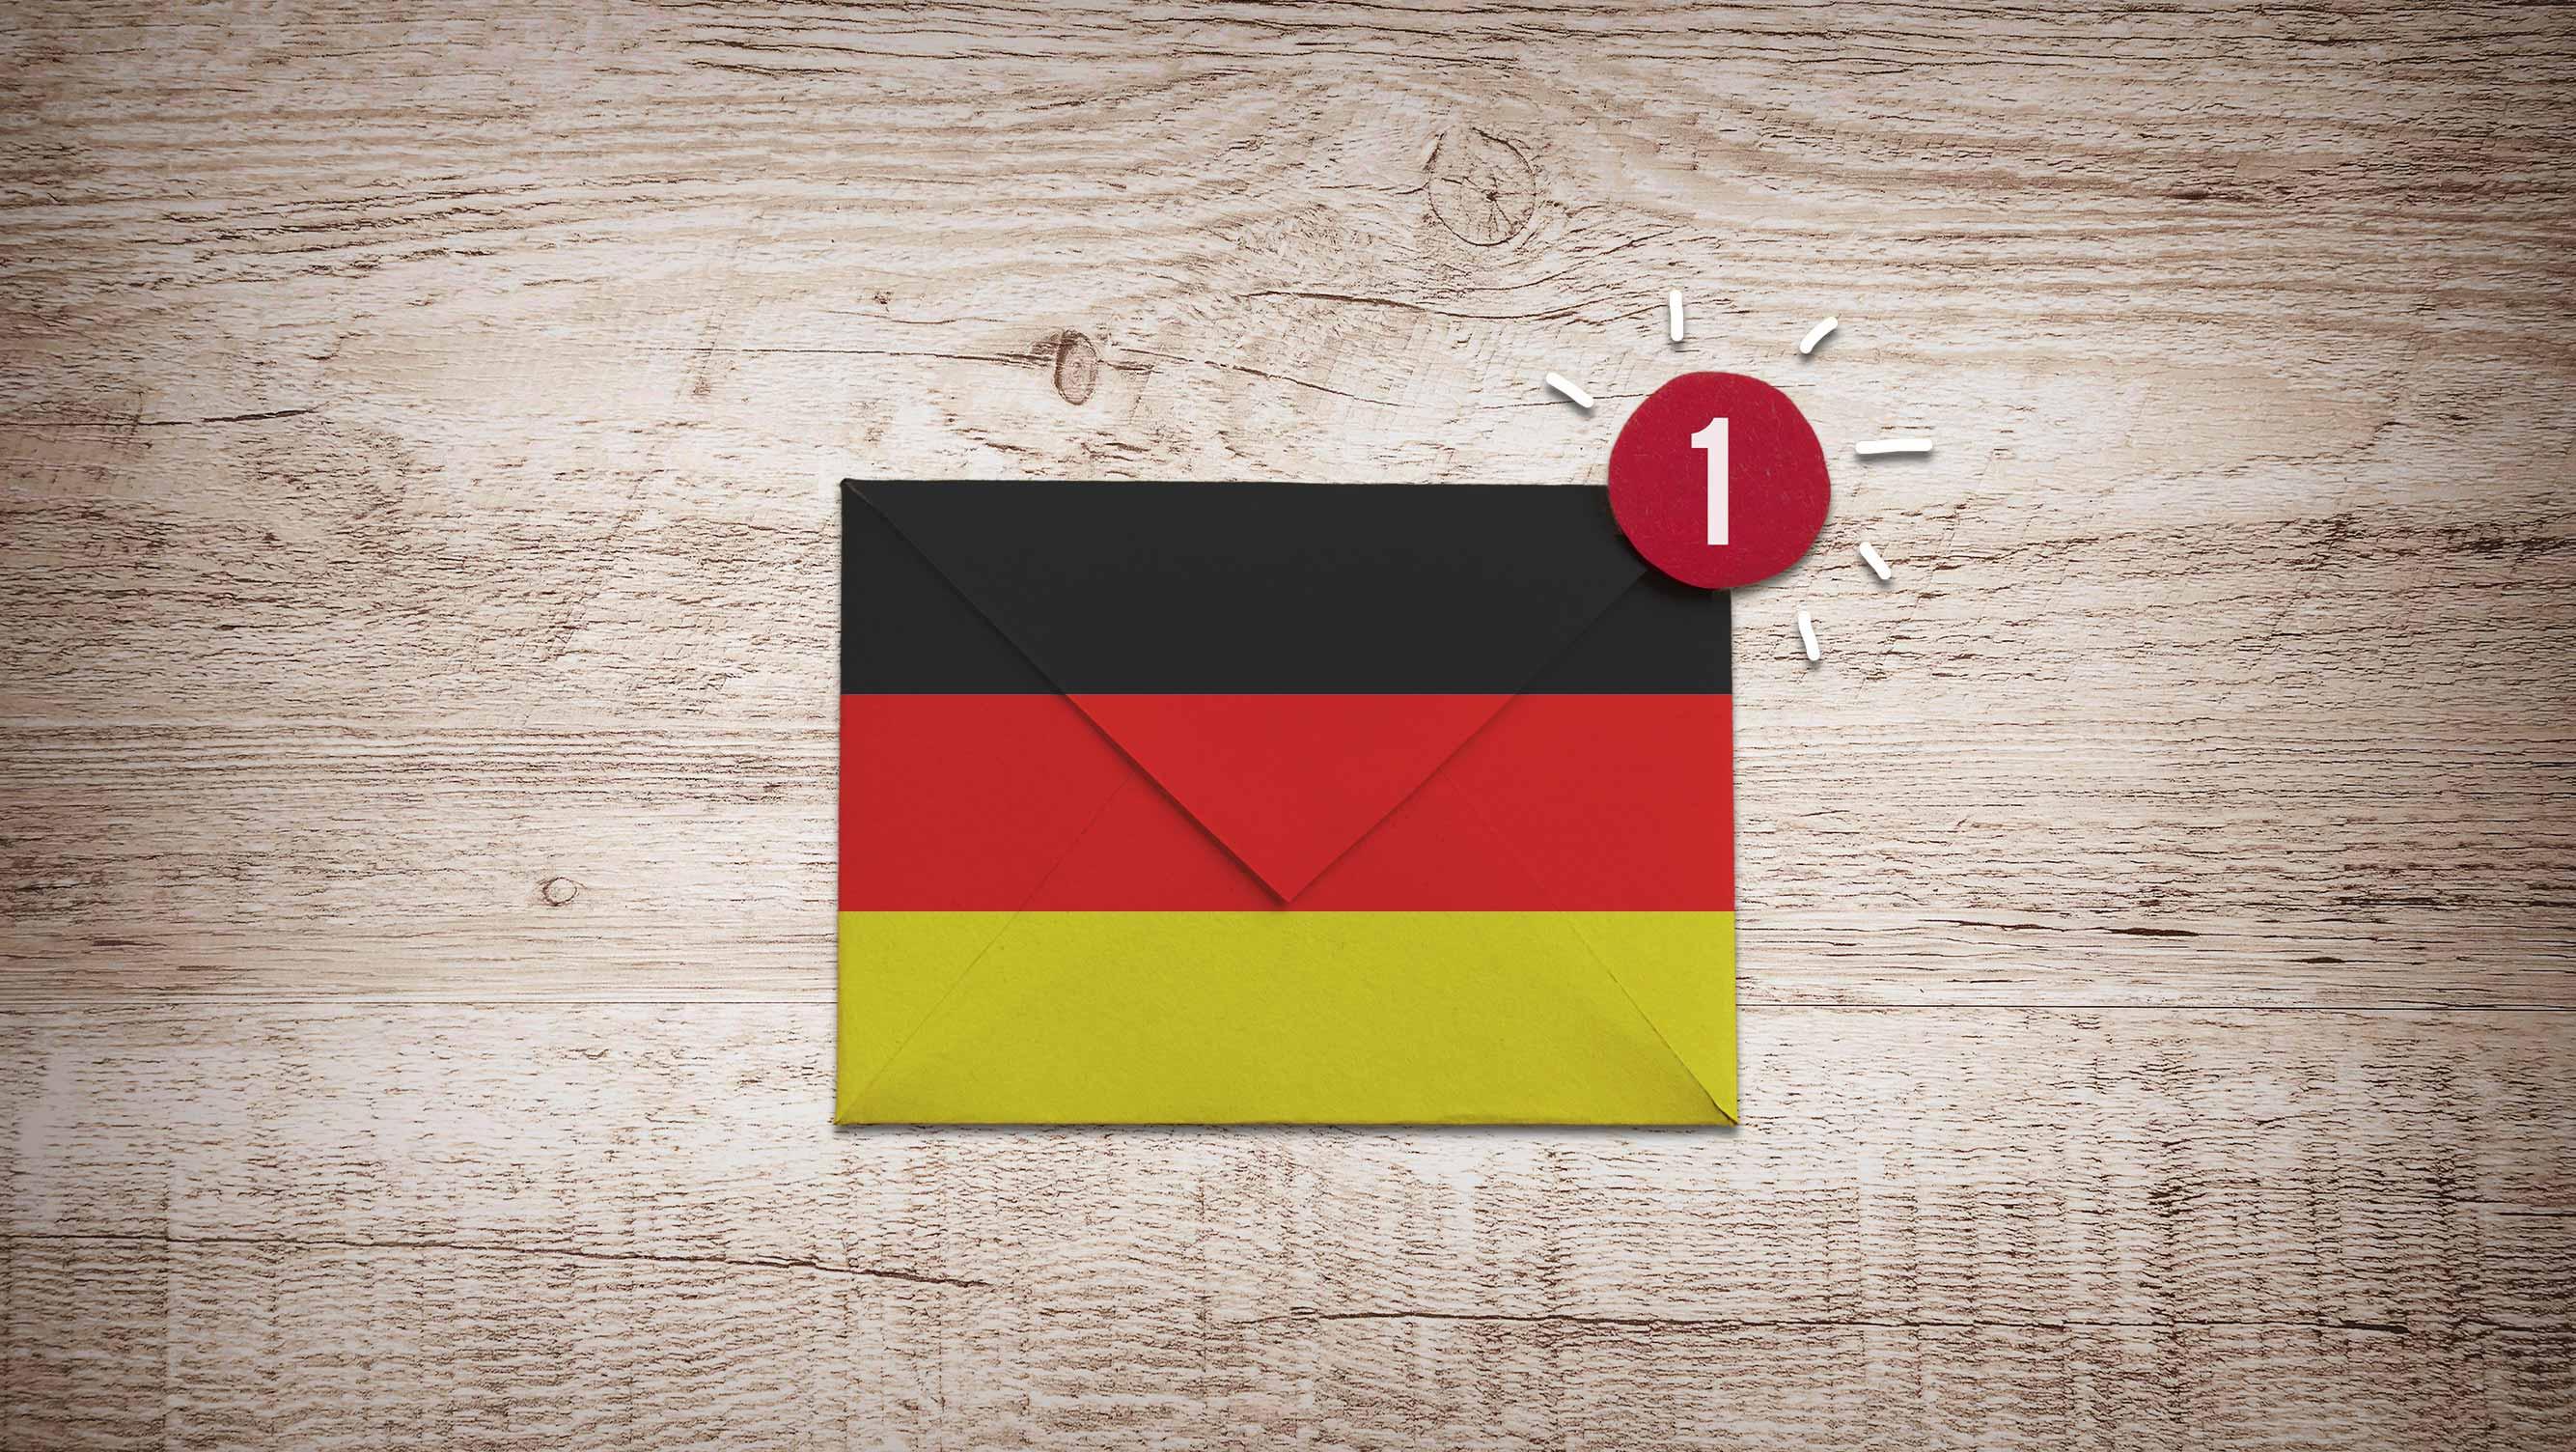 wm-aktion-newsletter-anmeldung-holzland-beese3